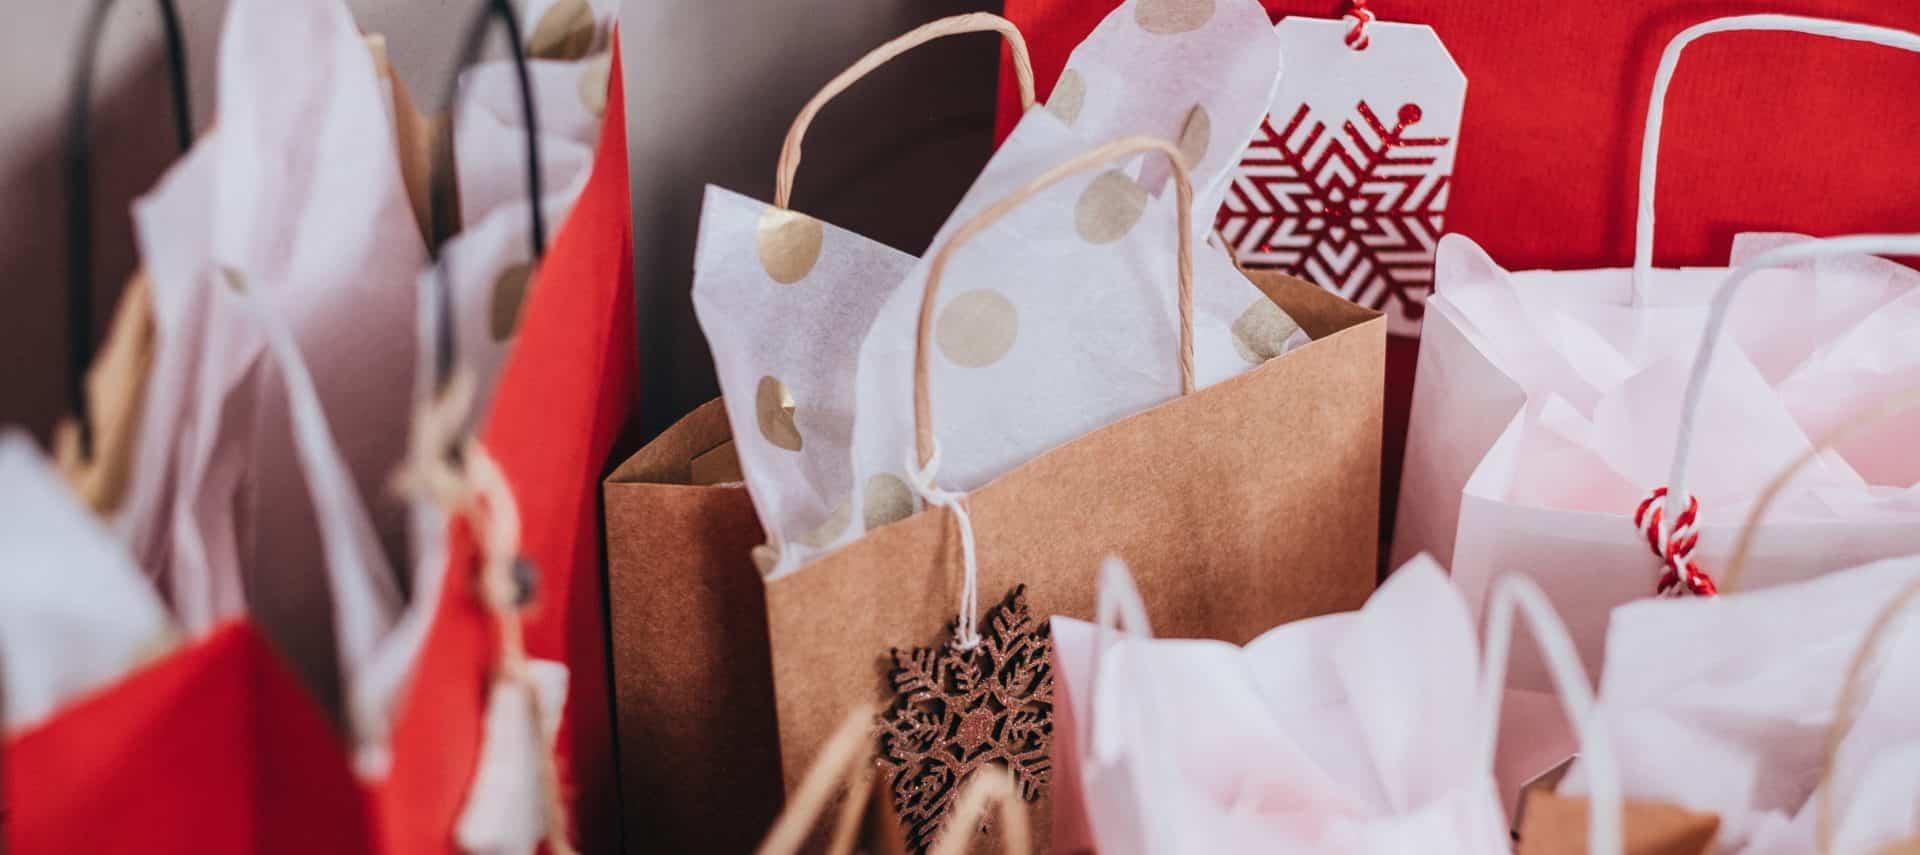 Several holiday shopping bags